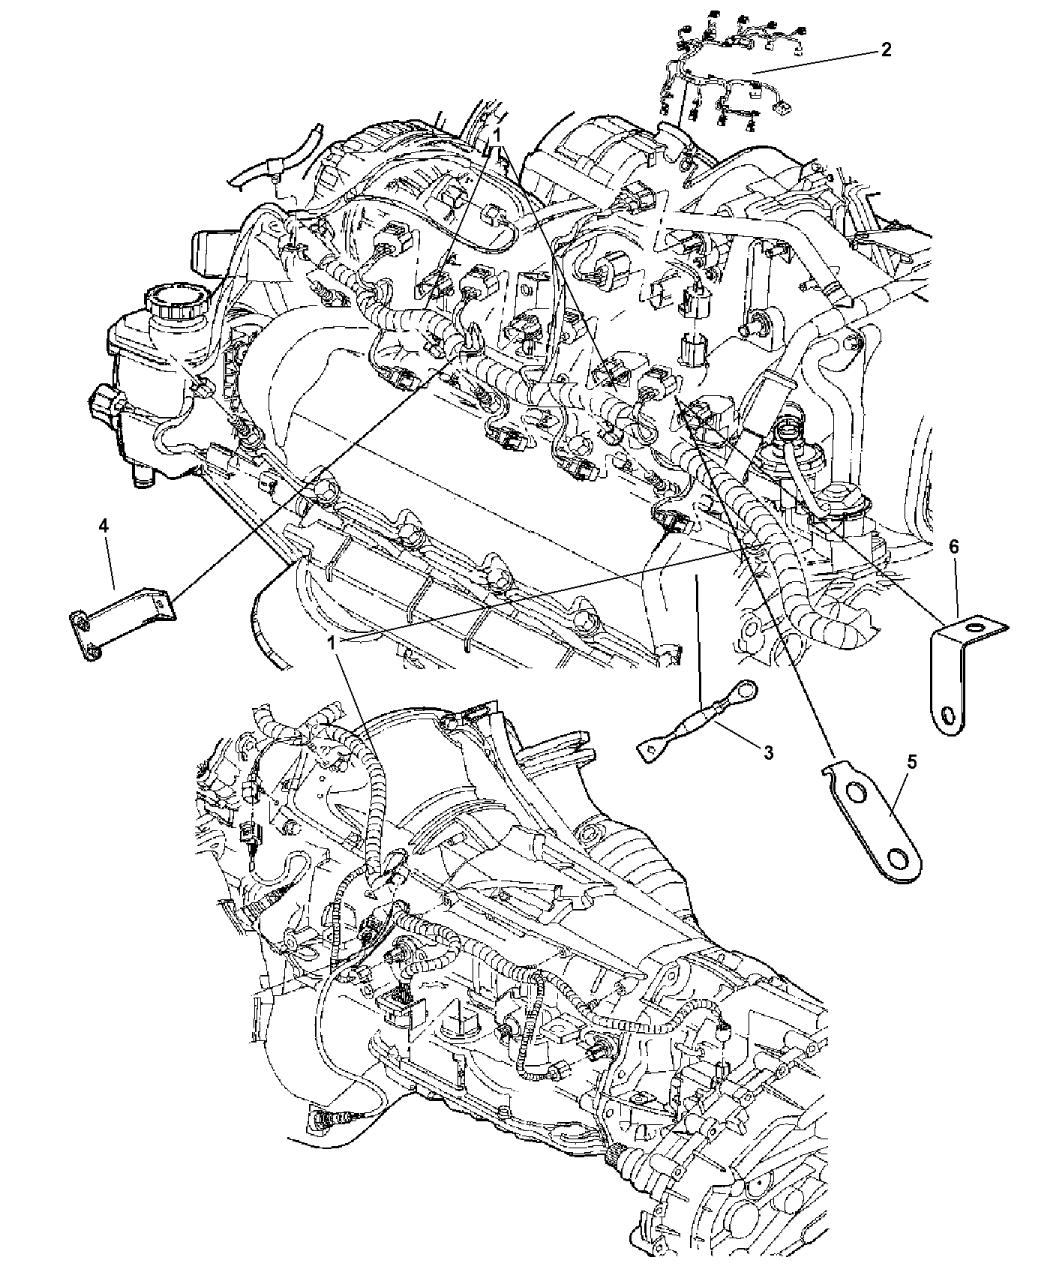 2005 Dodge Ram 1500 Wiring - Engine - Mopar Parts GiantMopar Parts Giant